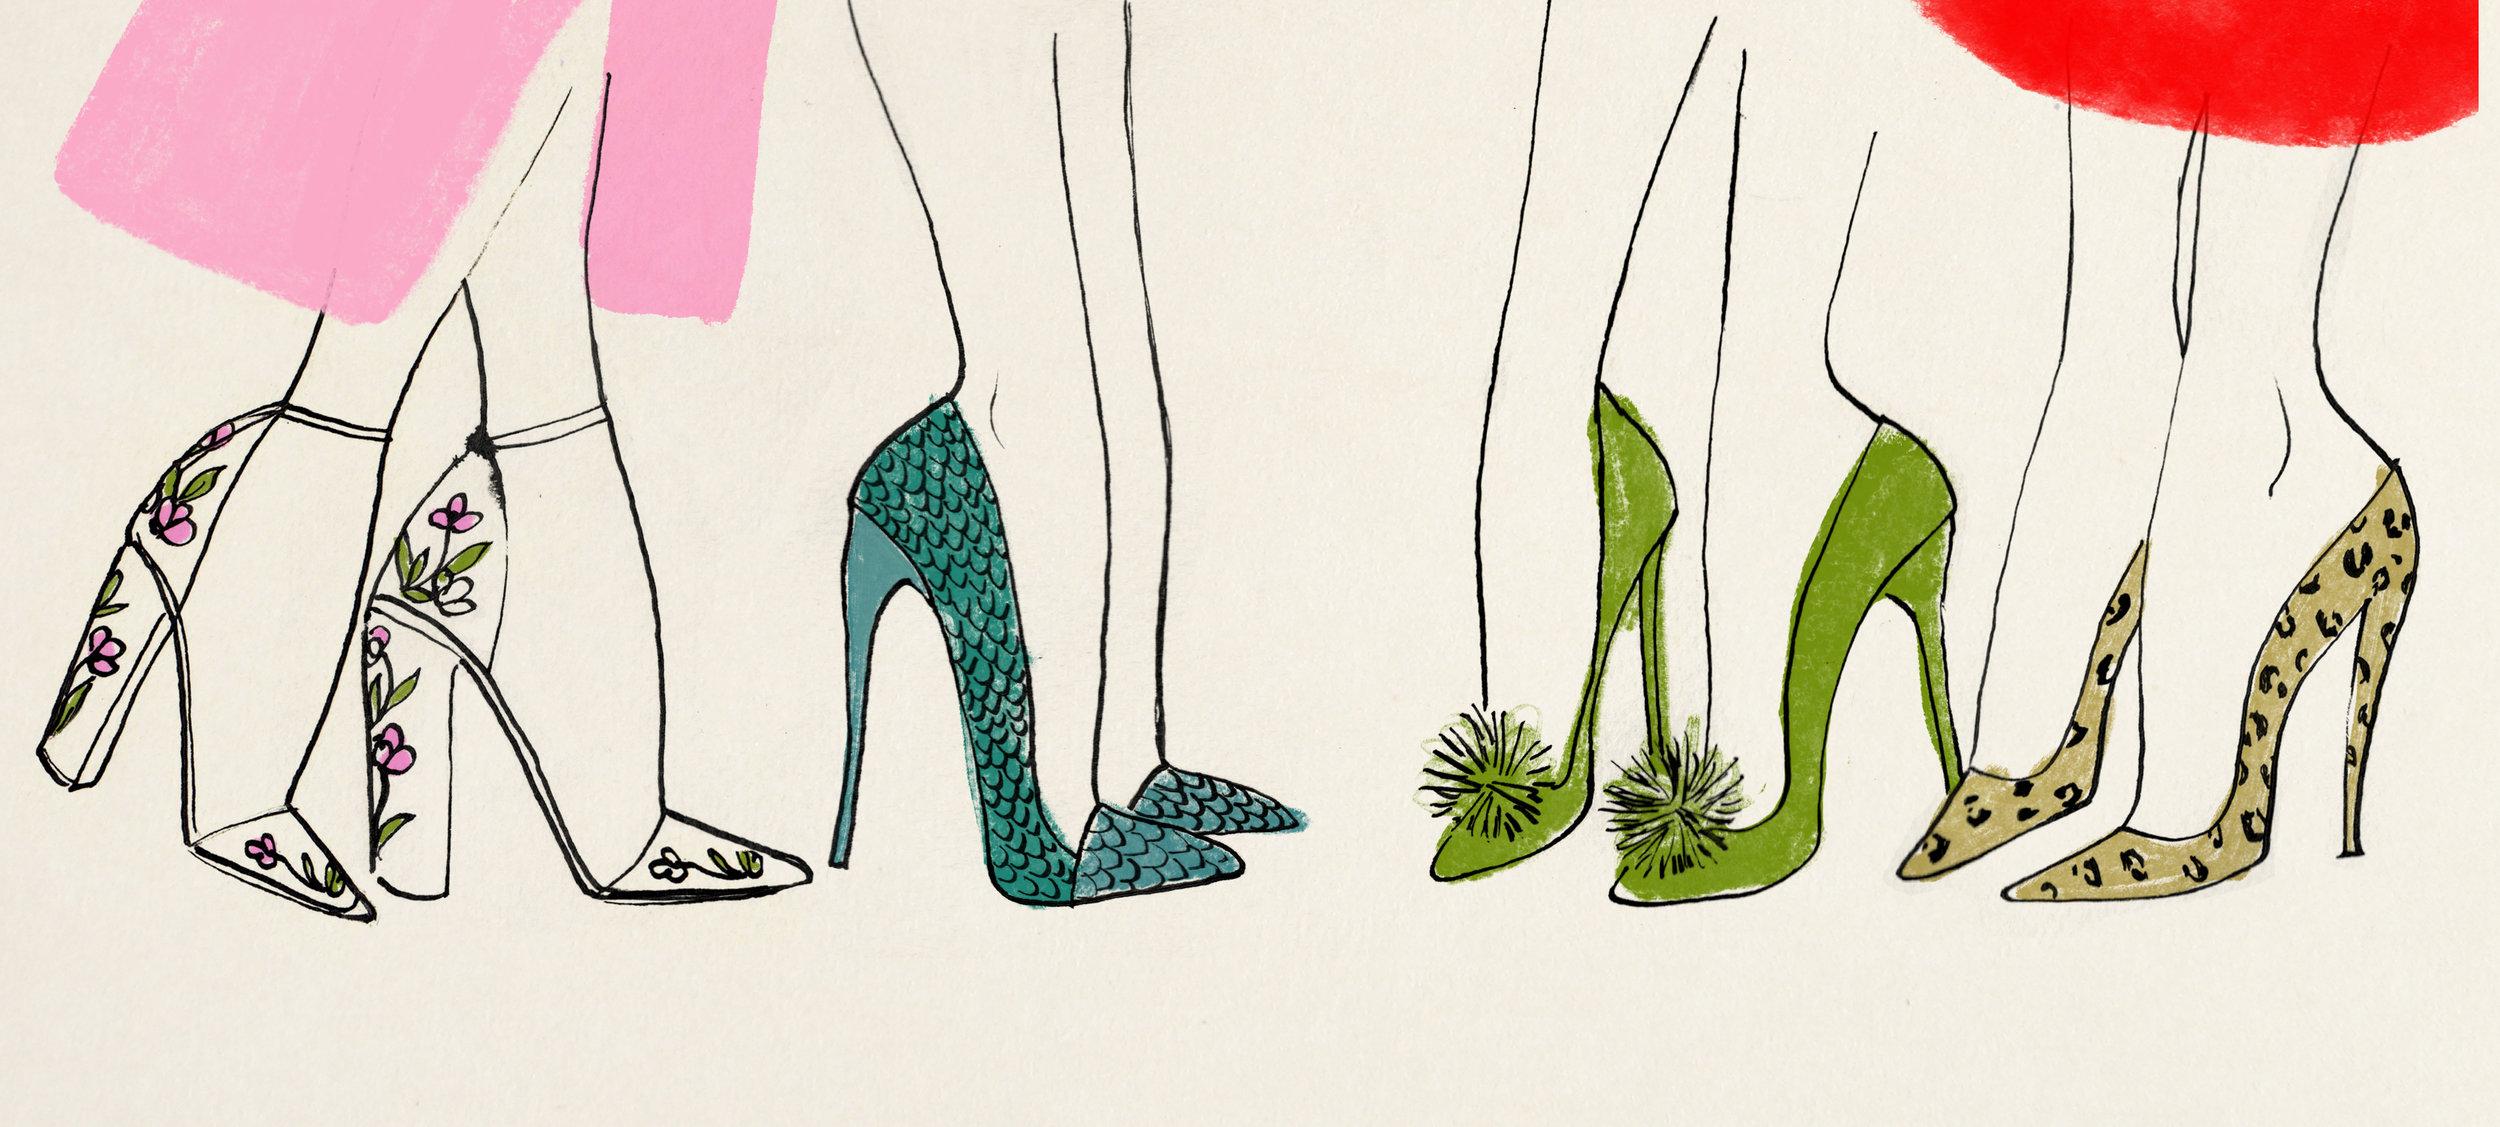 the shoes-ah.jpg